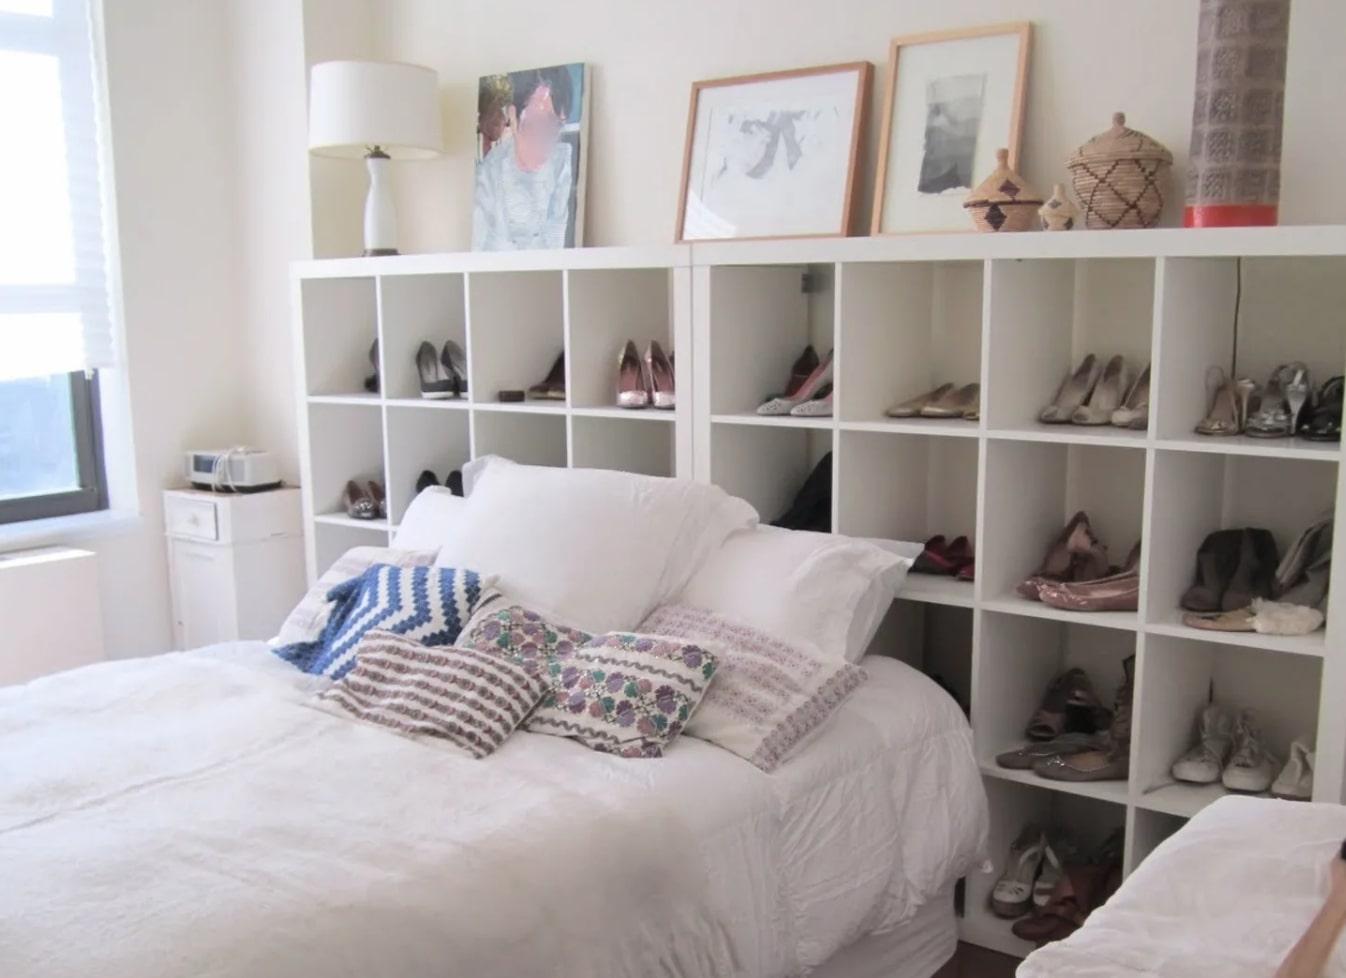 squarerooms-kallax-shoe-storage-organisers